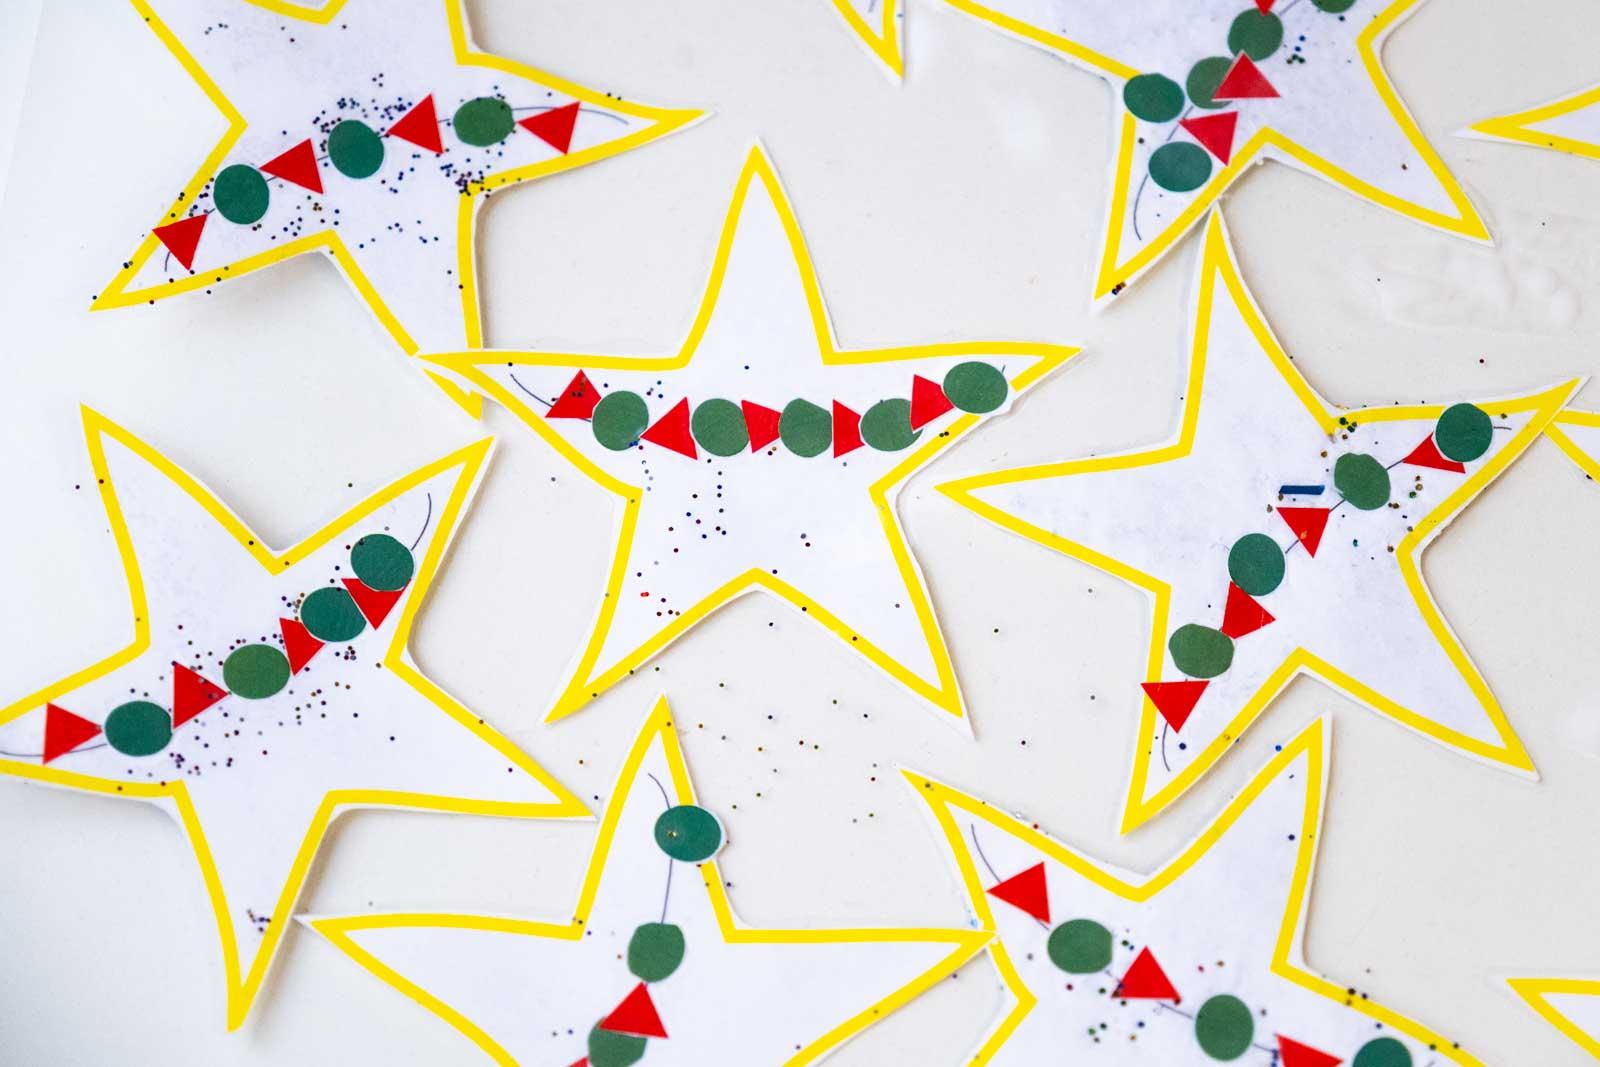 vivalys-petits-acrobates-algorithme-4